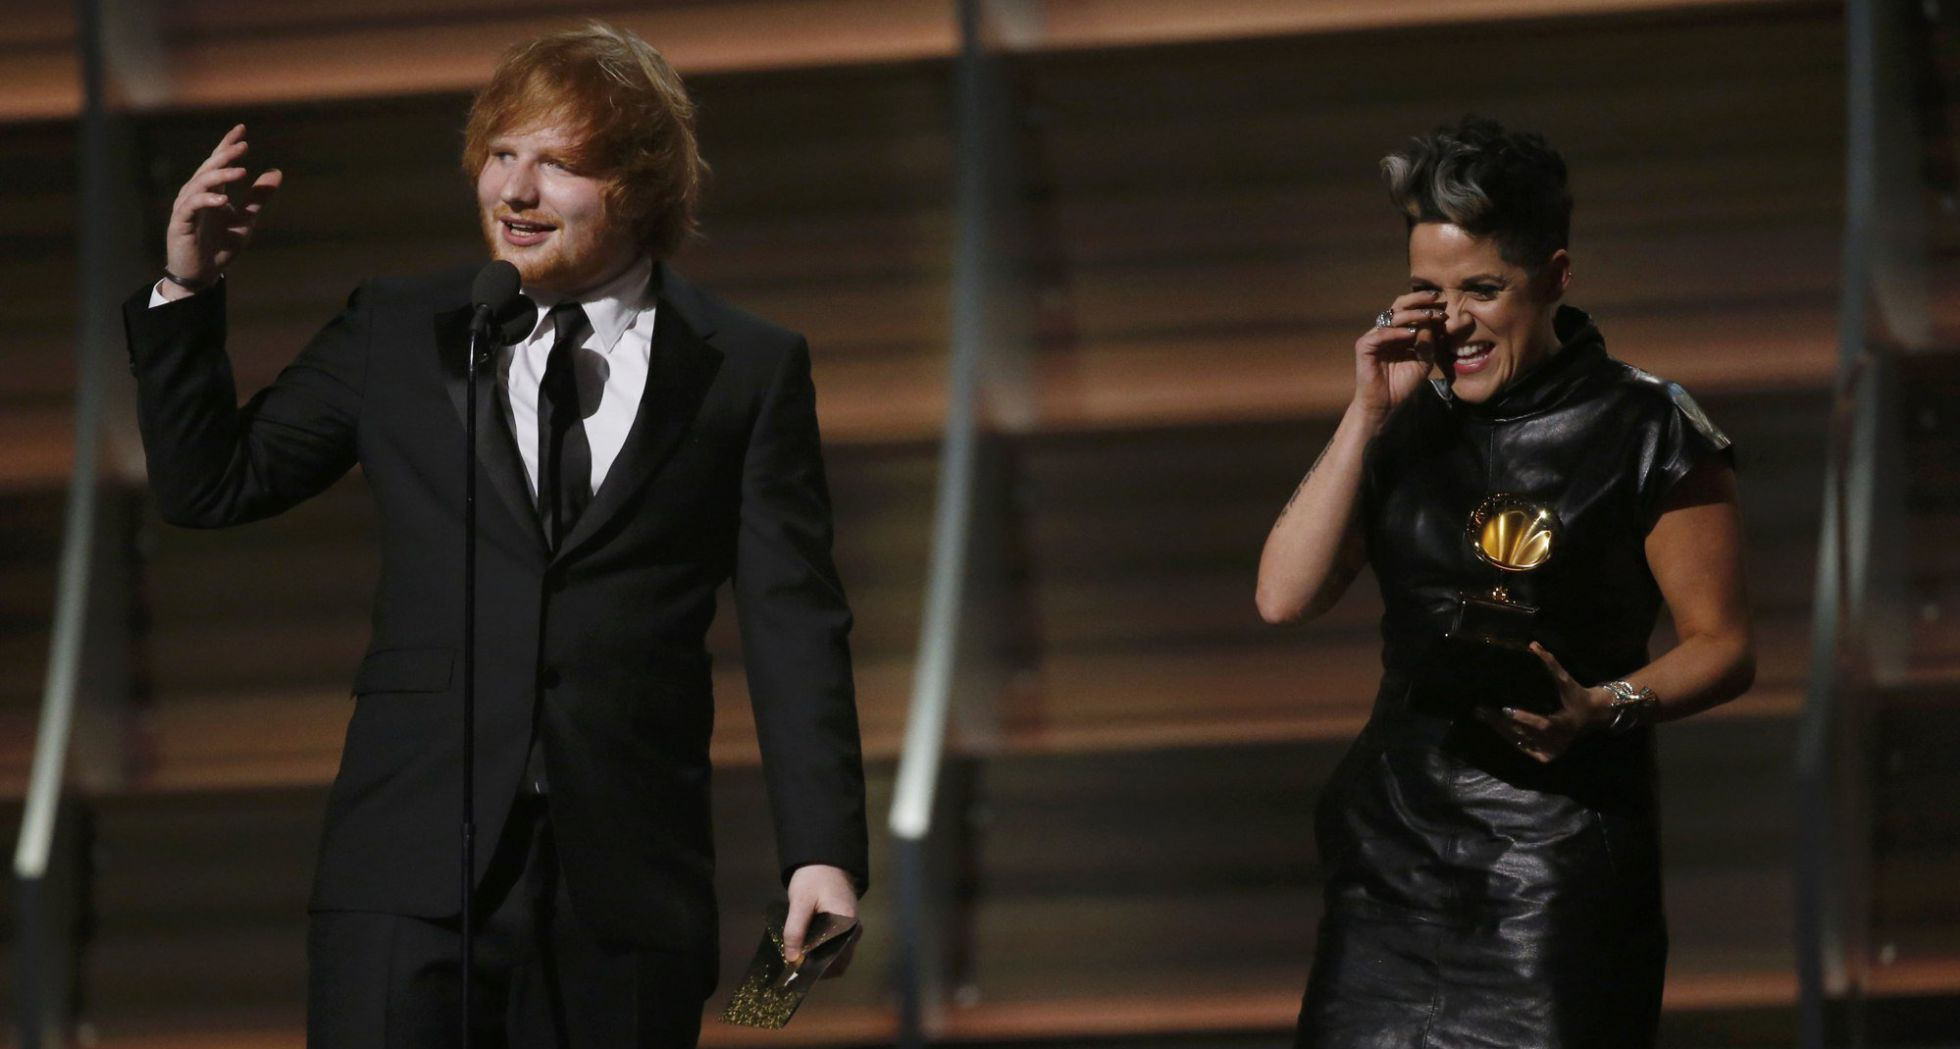 Ed - Ganadores de Grammys 2016